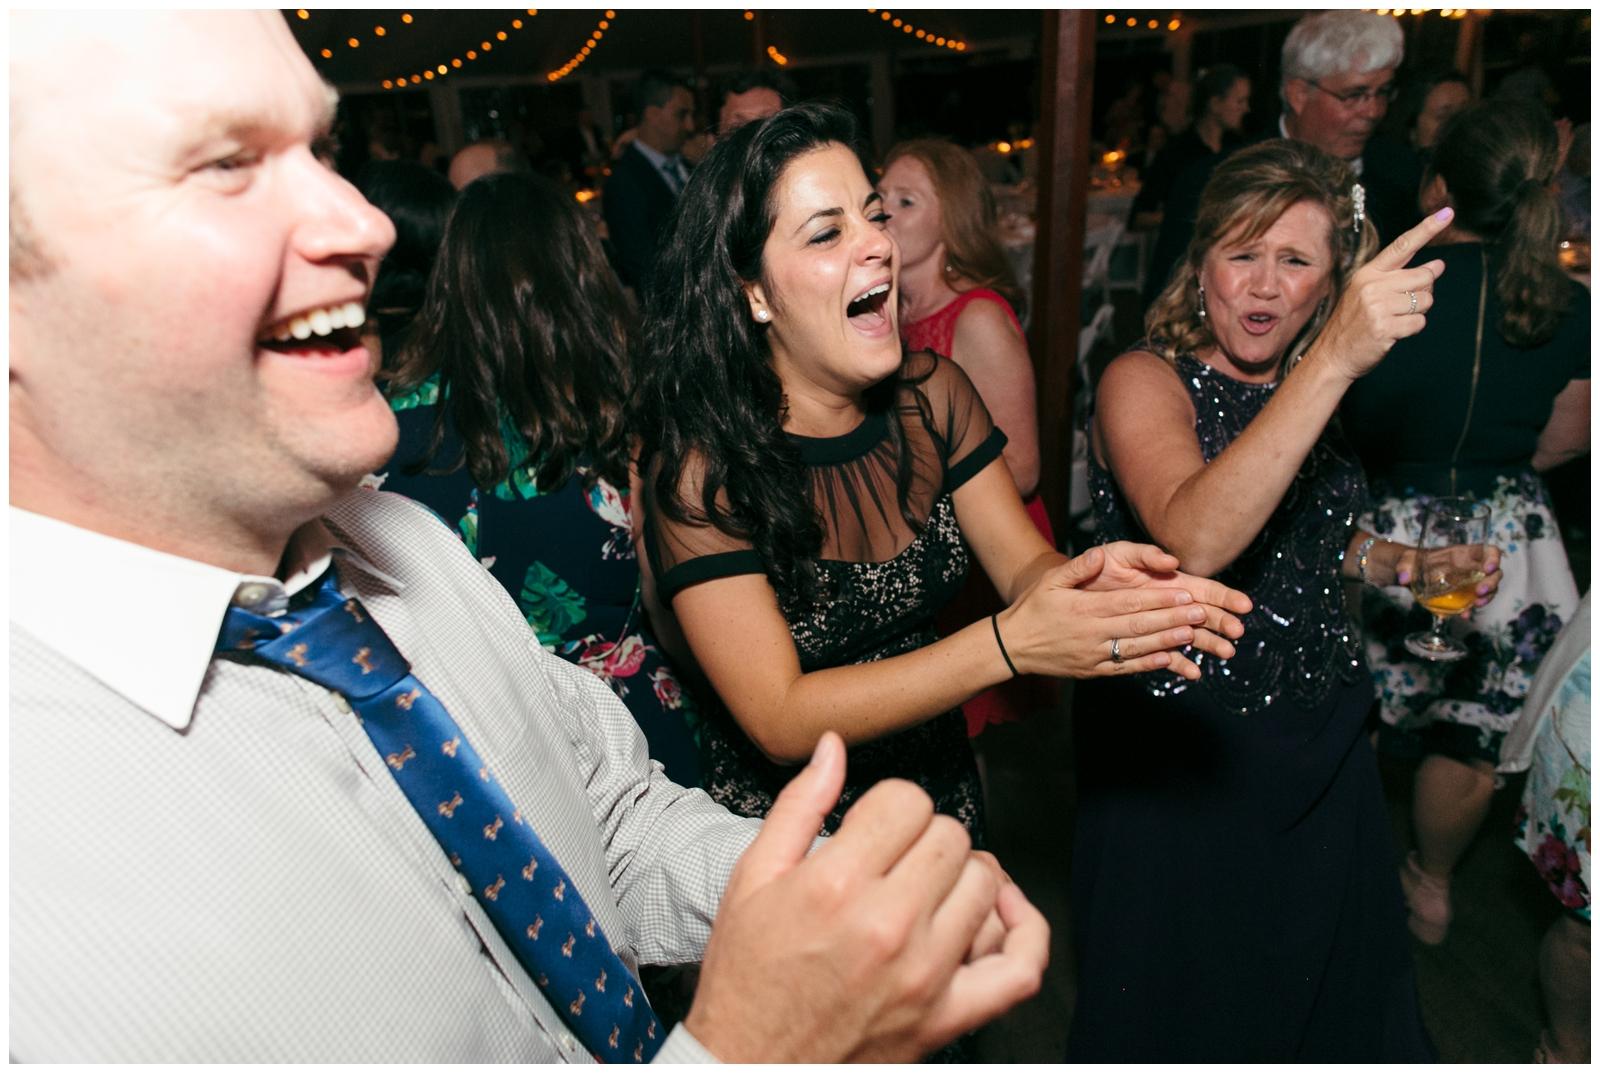 Moraine-Farm-wedding-Bailey-Q-Photo-Massachusetts-wedding-photpgrapher-162.jpg